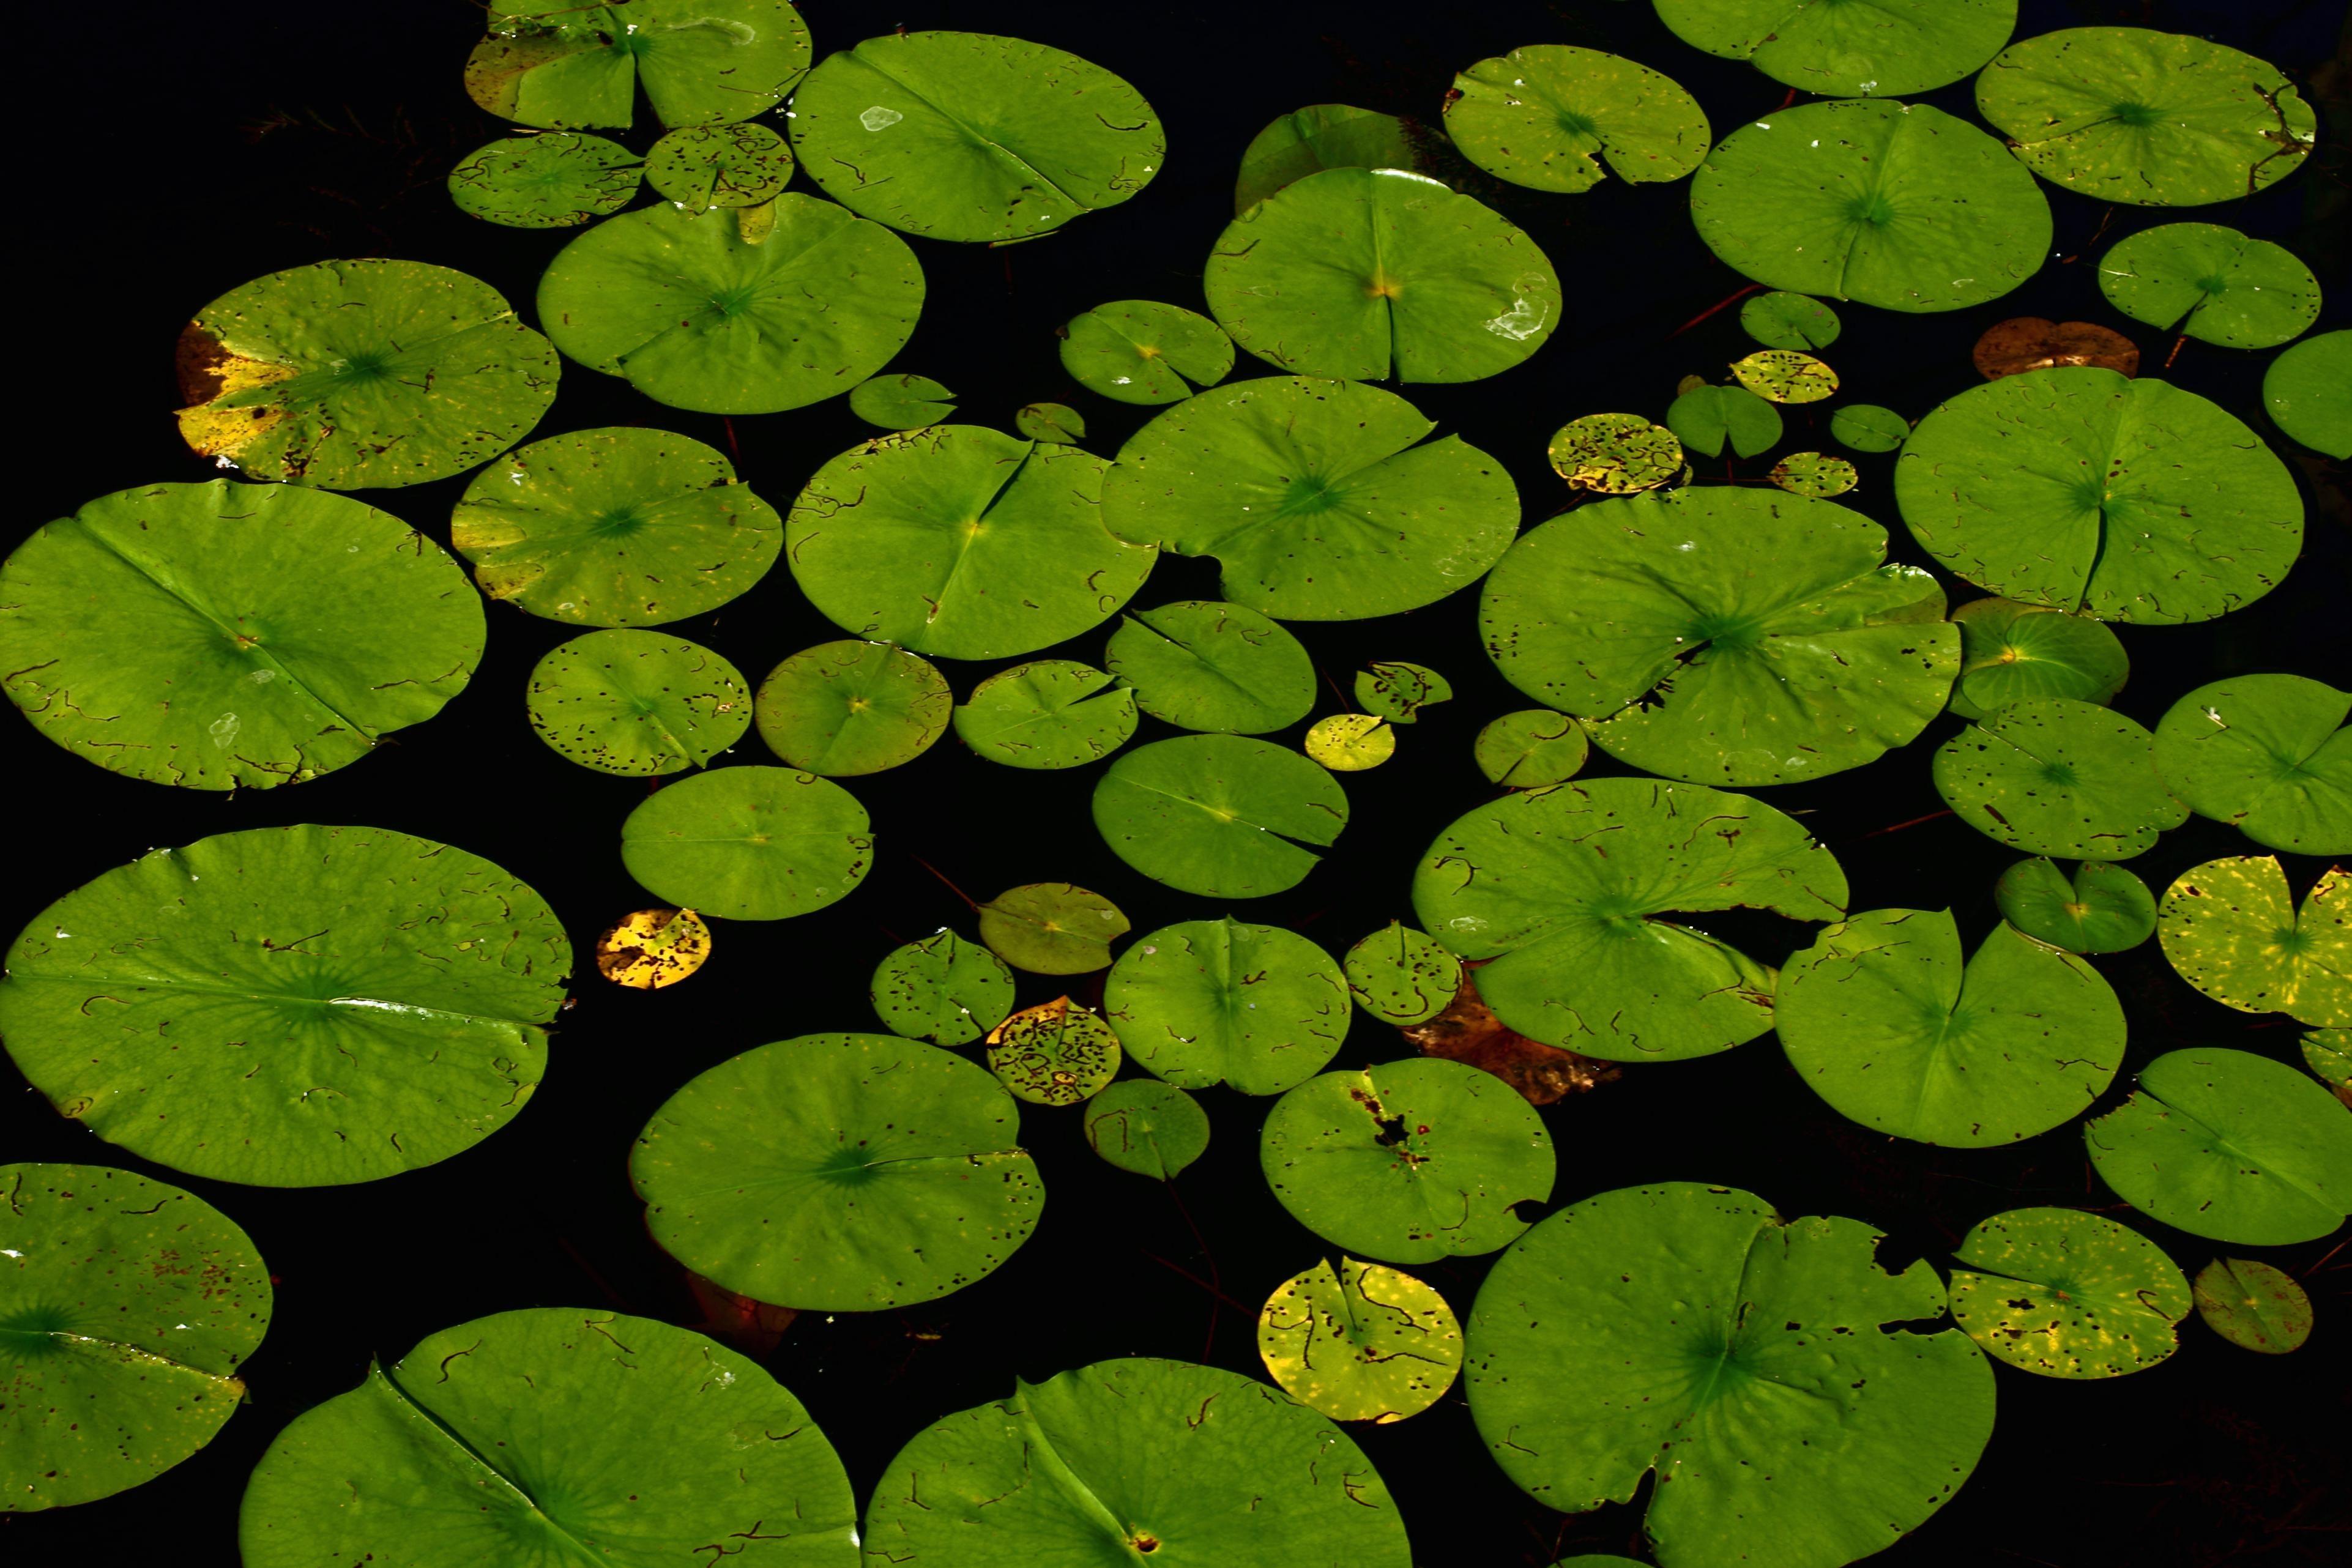 Imagen Gratis Loto Hoja Lirio Flora Acu 225 Tico Agua Jard 237 N Flor Lago